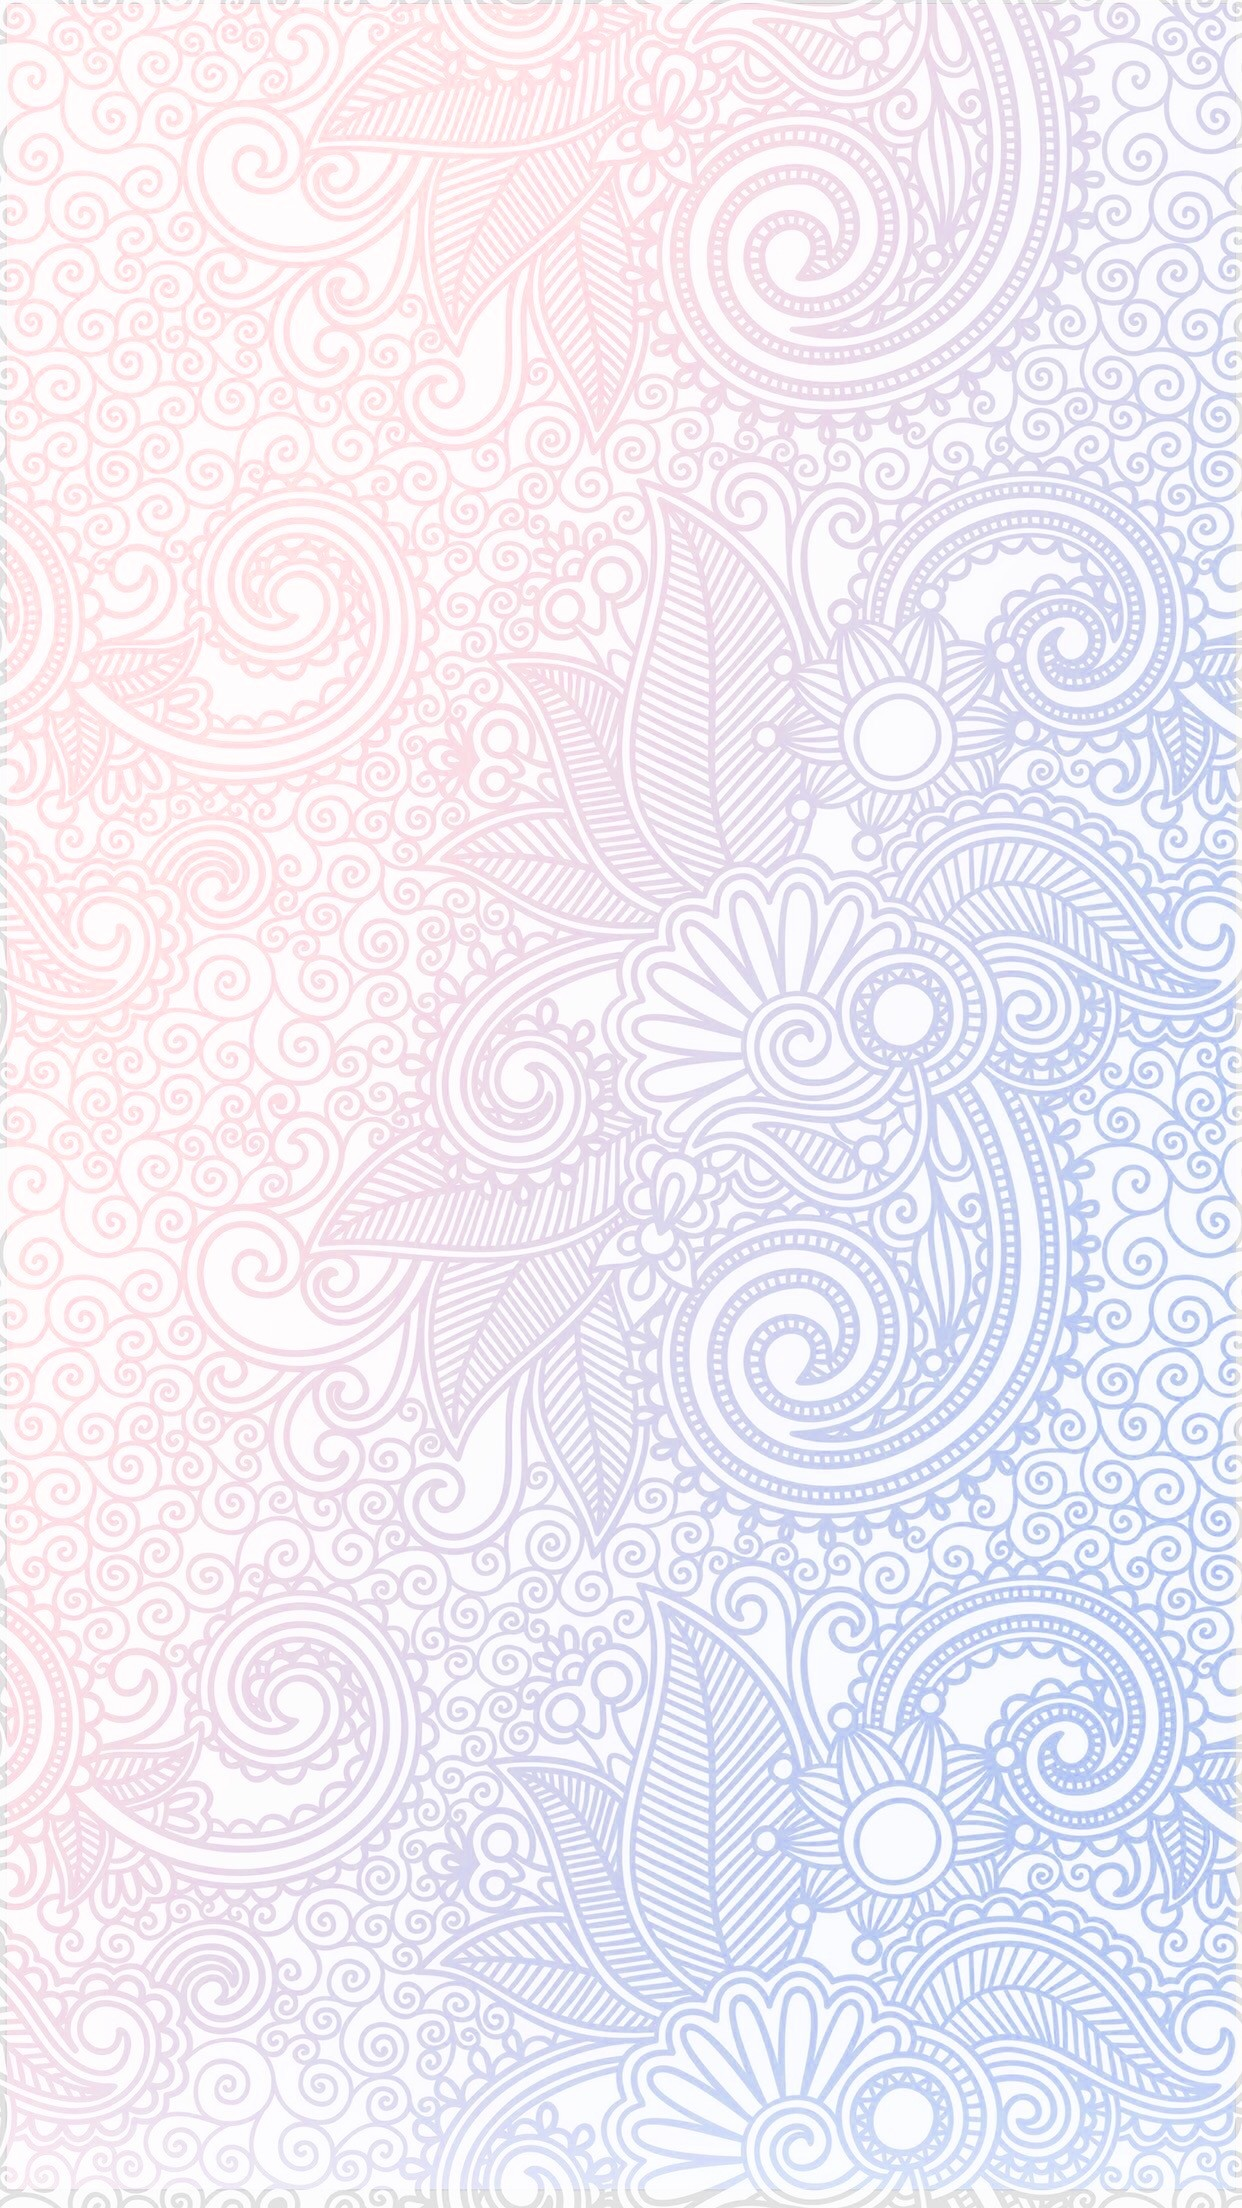 iPhone wallpaper serenity rose quartz Pantone 2016 background